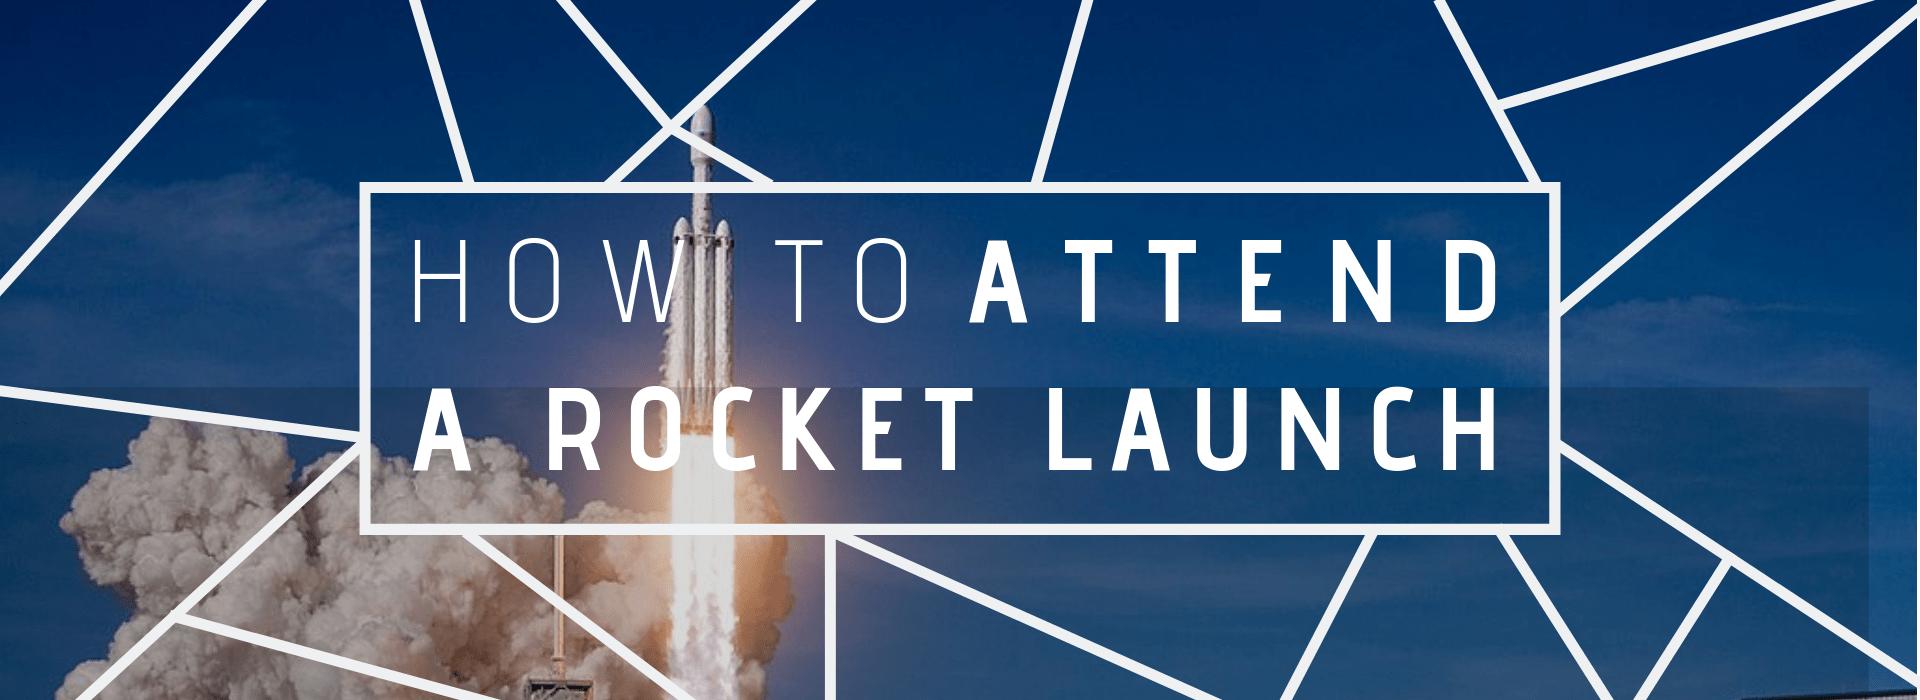 attend a rocket launch